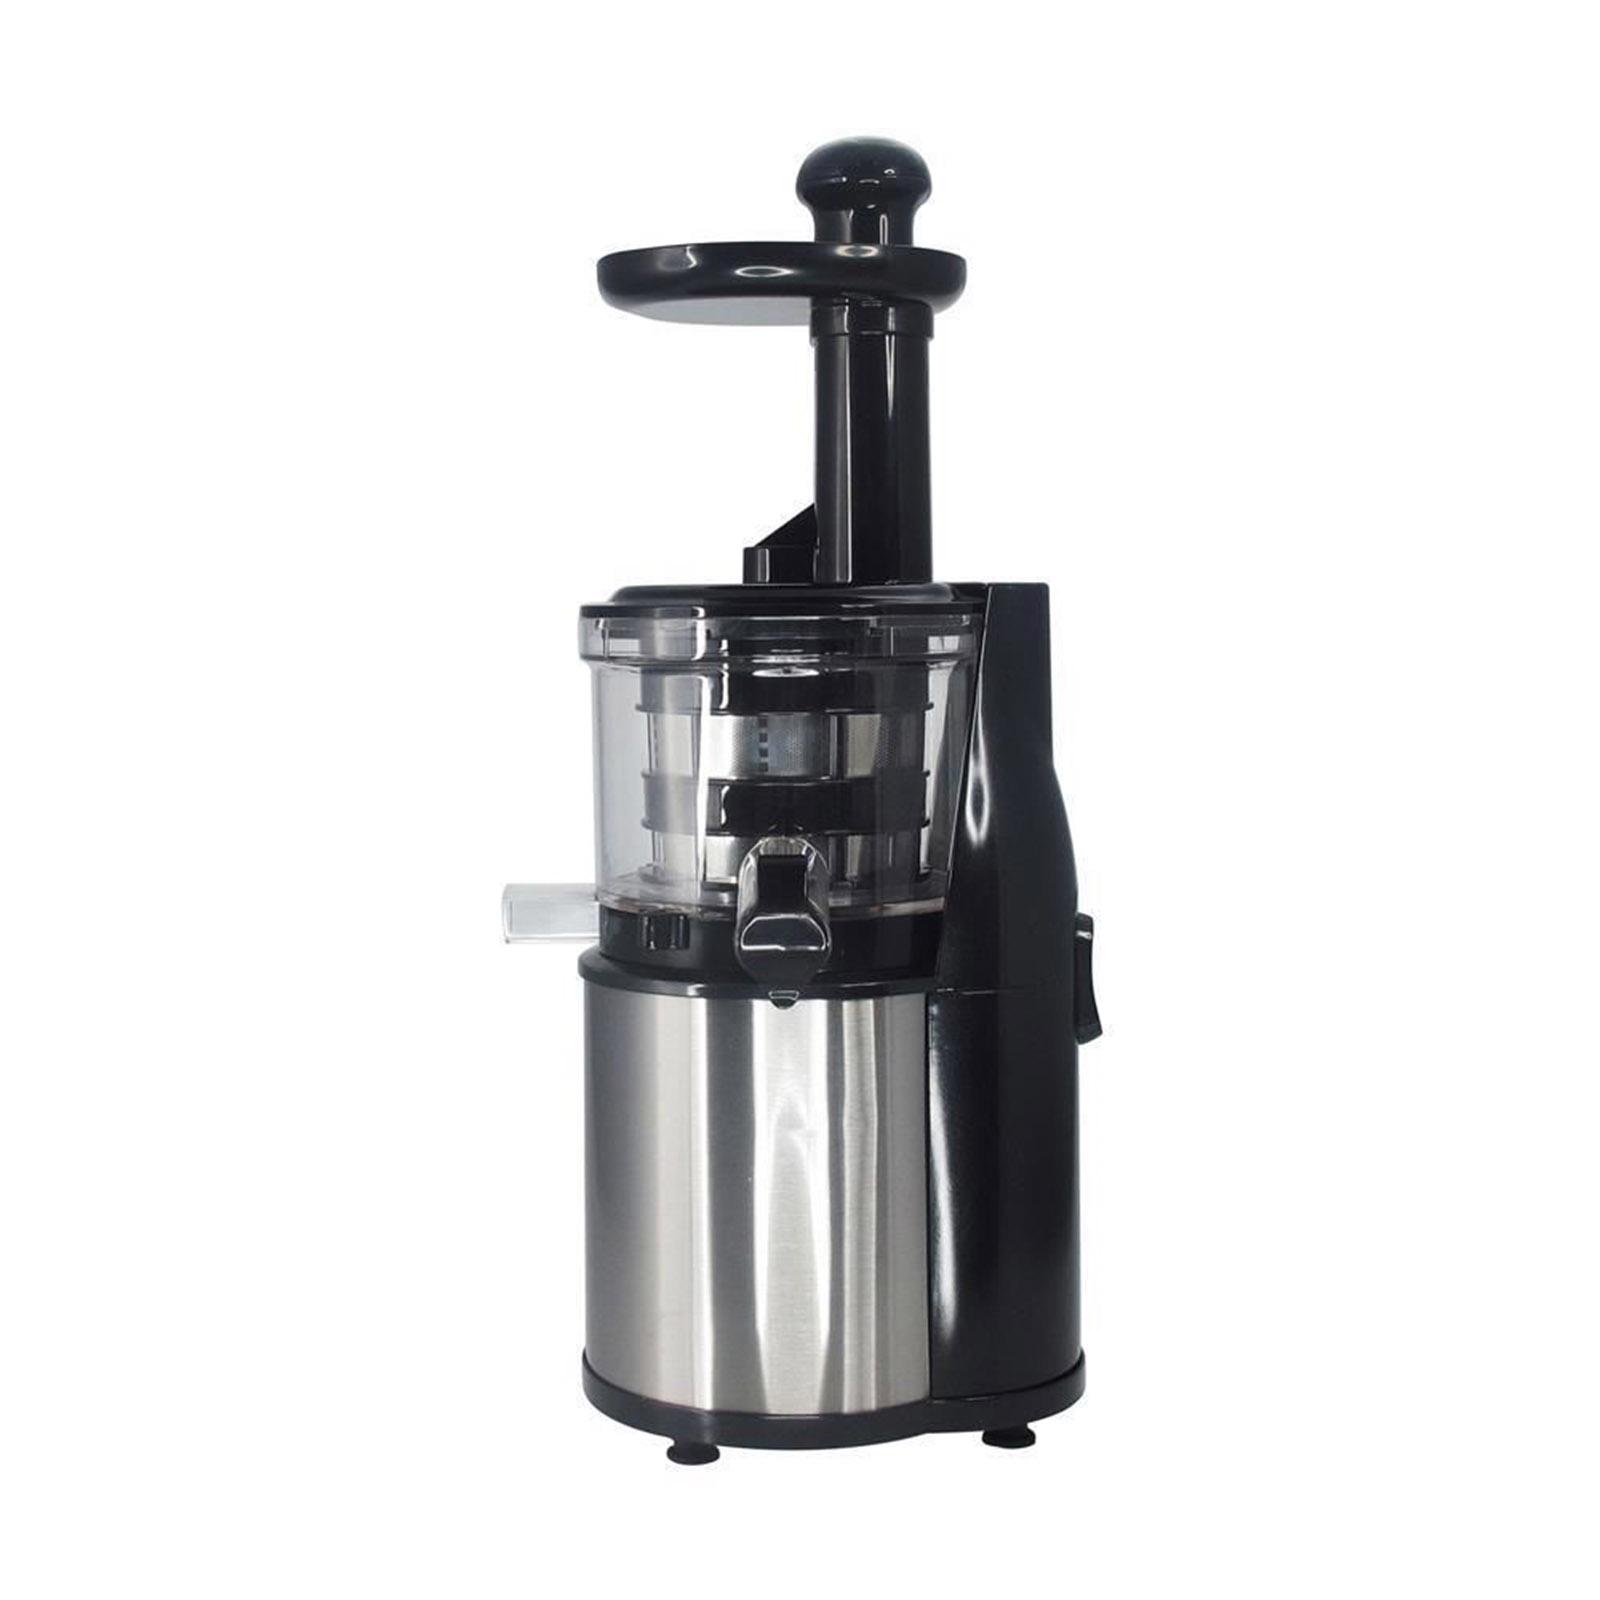 NutriChef Kitchen Countertop Masticating Slow Juicer